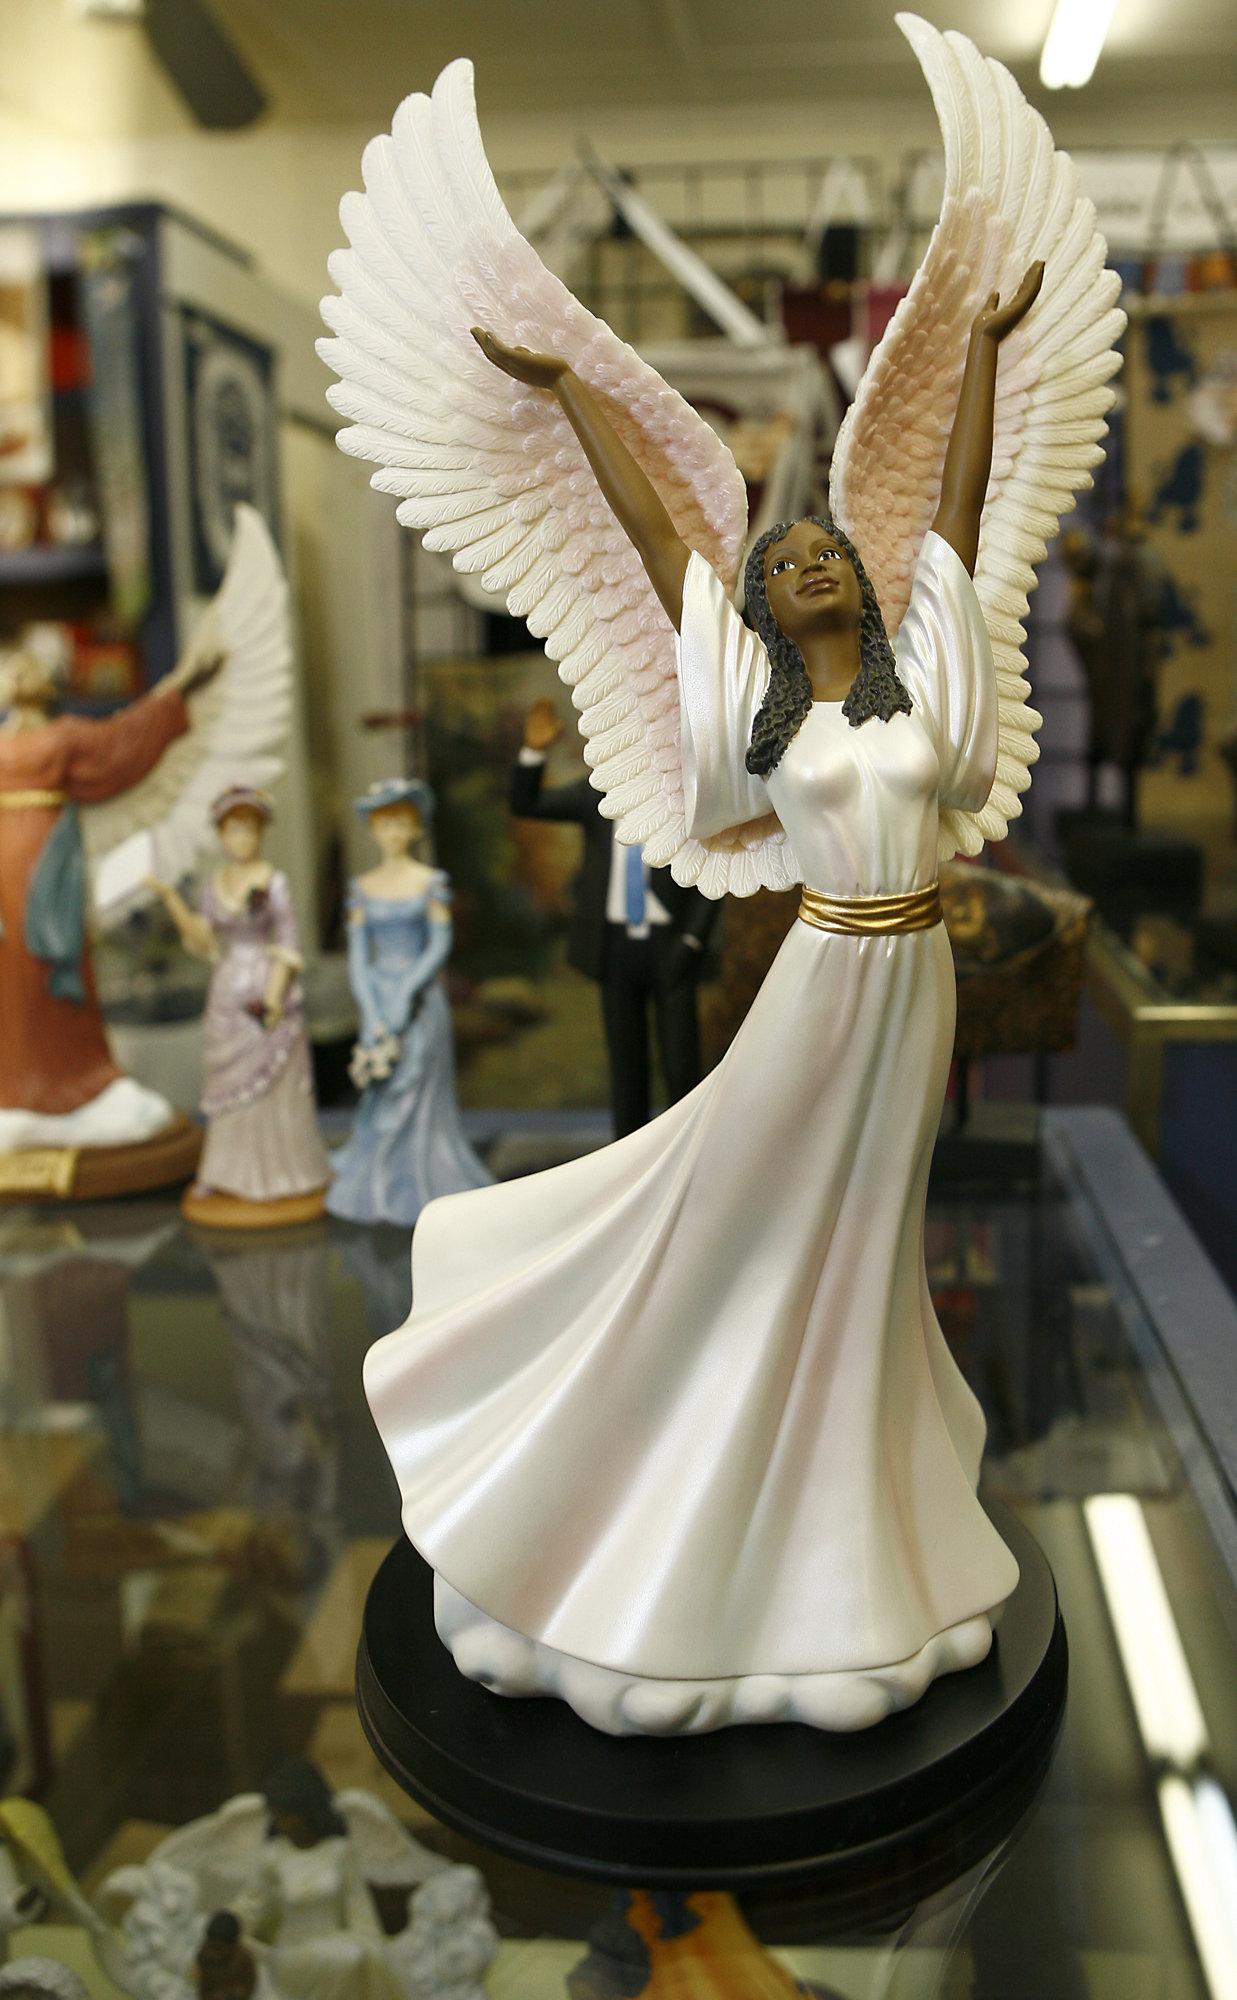 African american angels wallpaper wallpapersafari - Angels figurines for sale ...